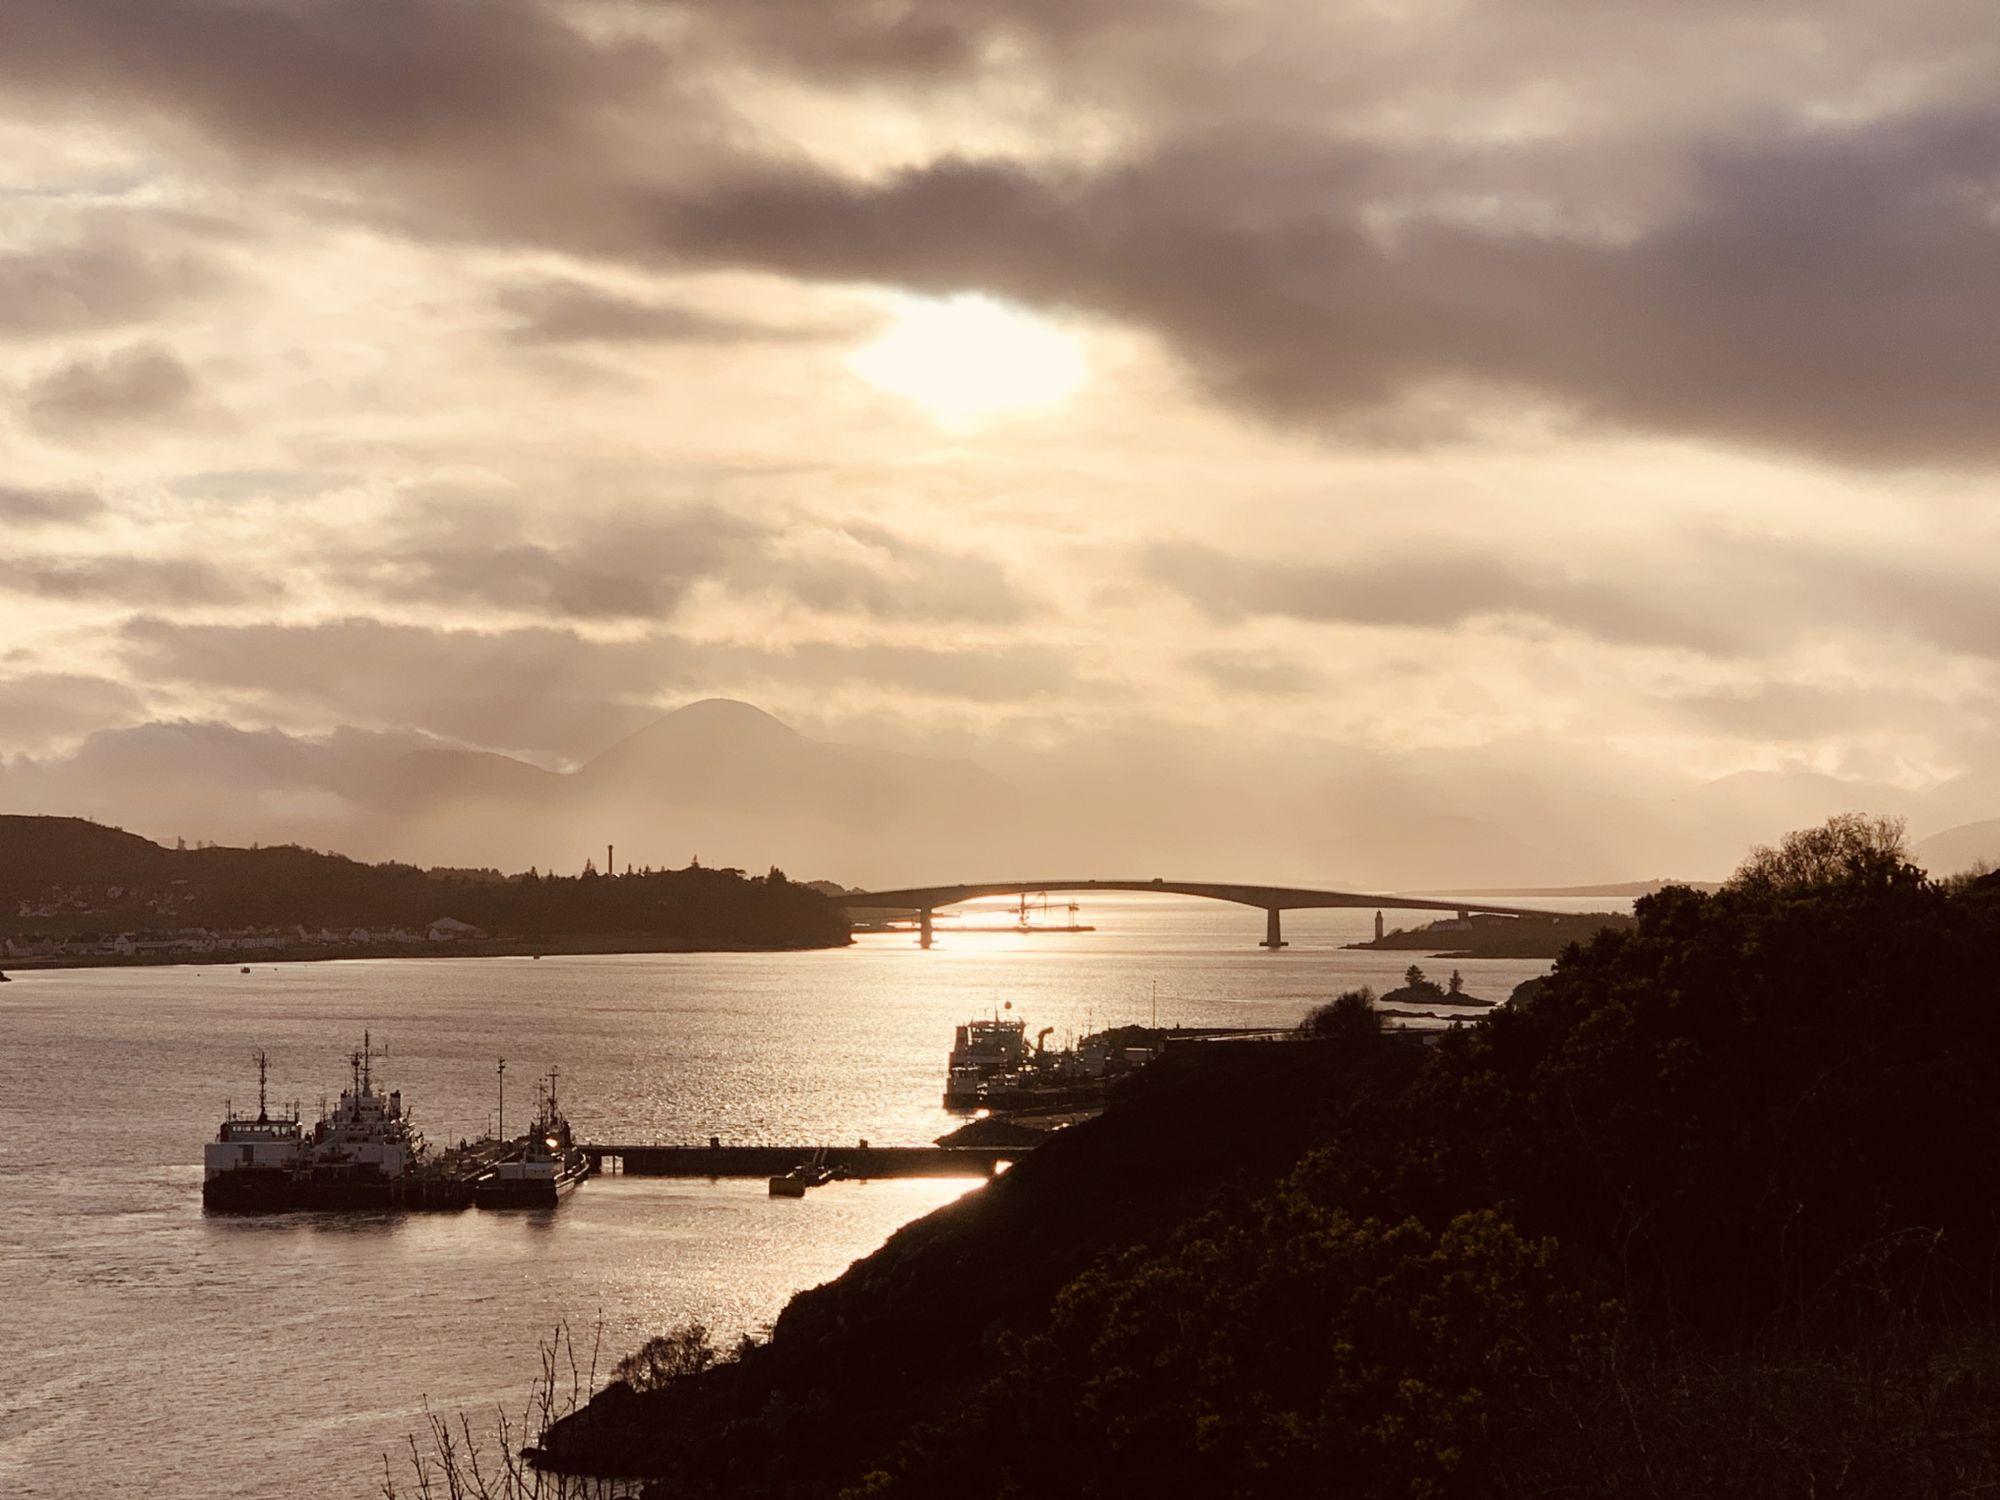 Skye Bridge silhouette